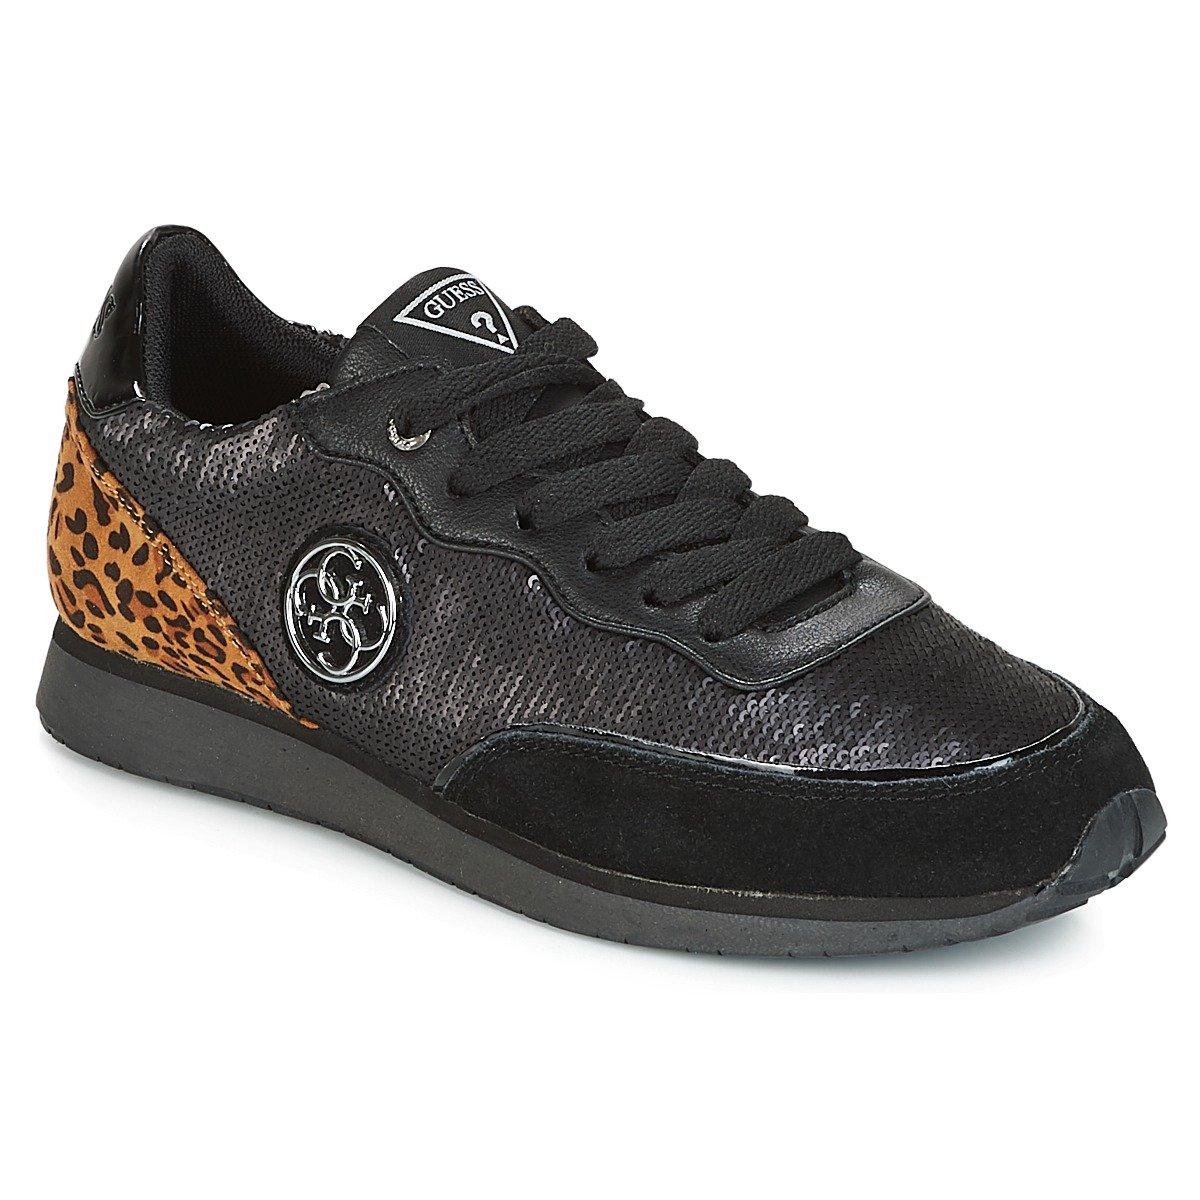 Guess Sunny, Zapatillas de Gimnasia para Mujer 41 EU Negro (Black Black)